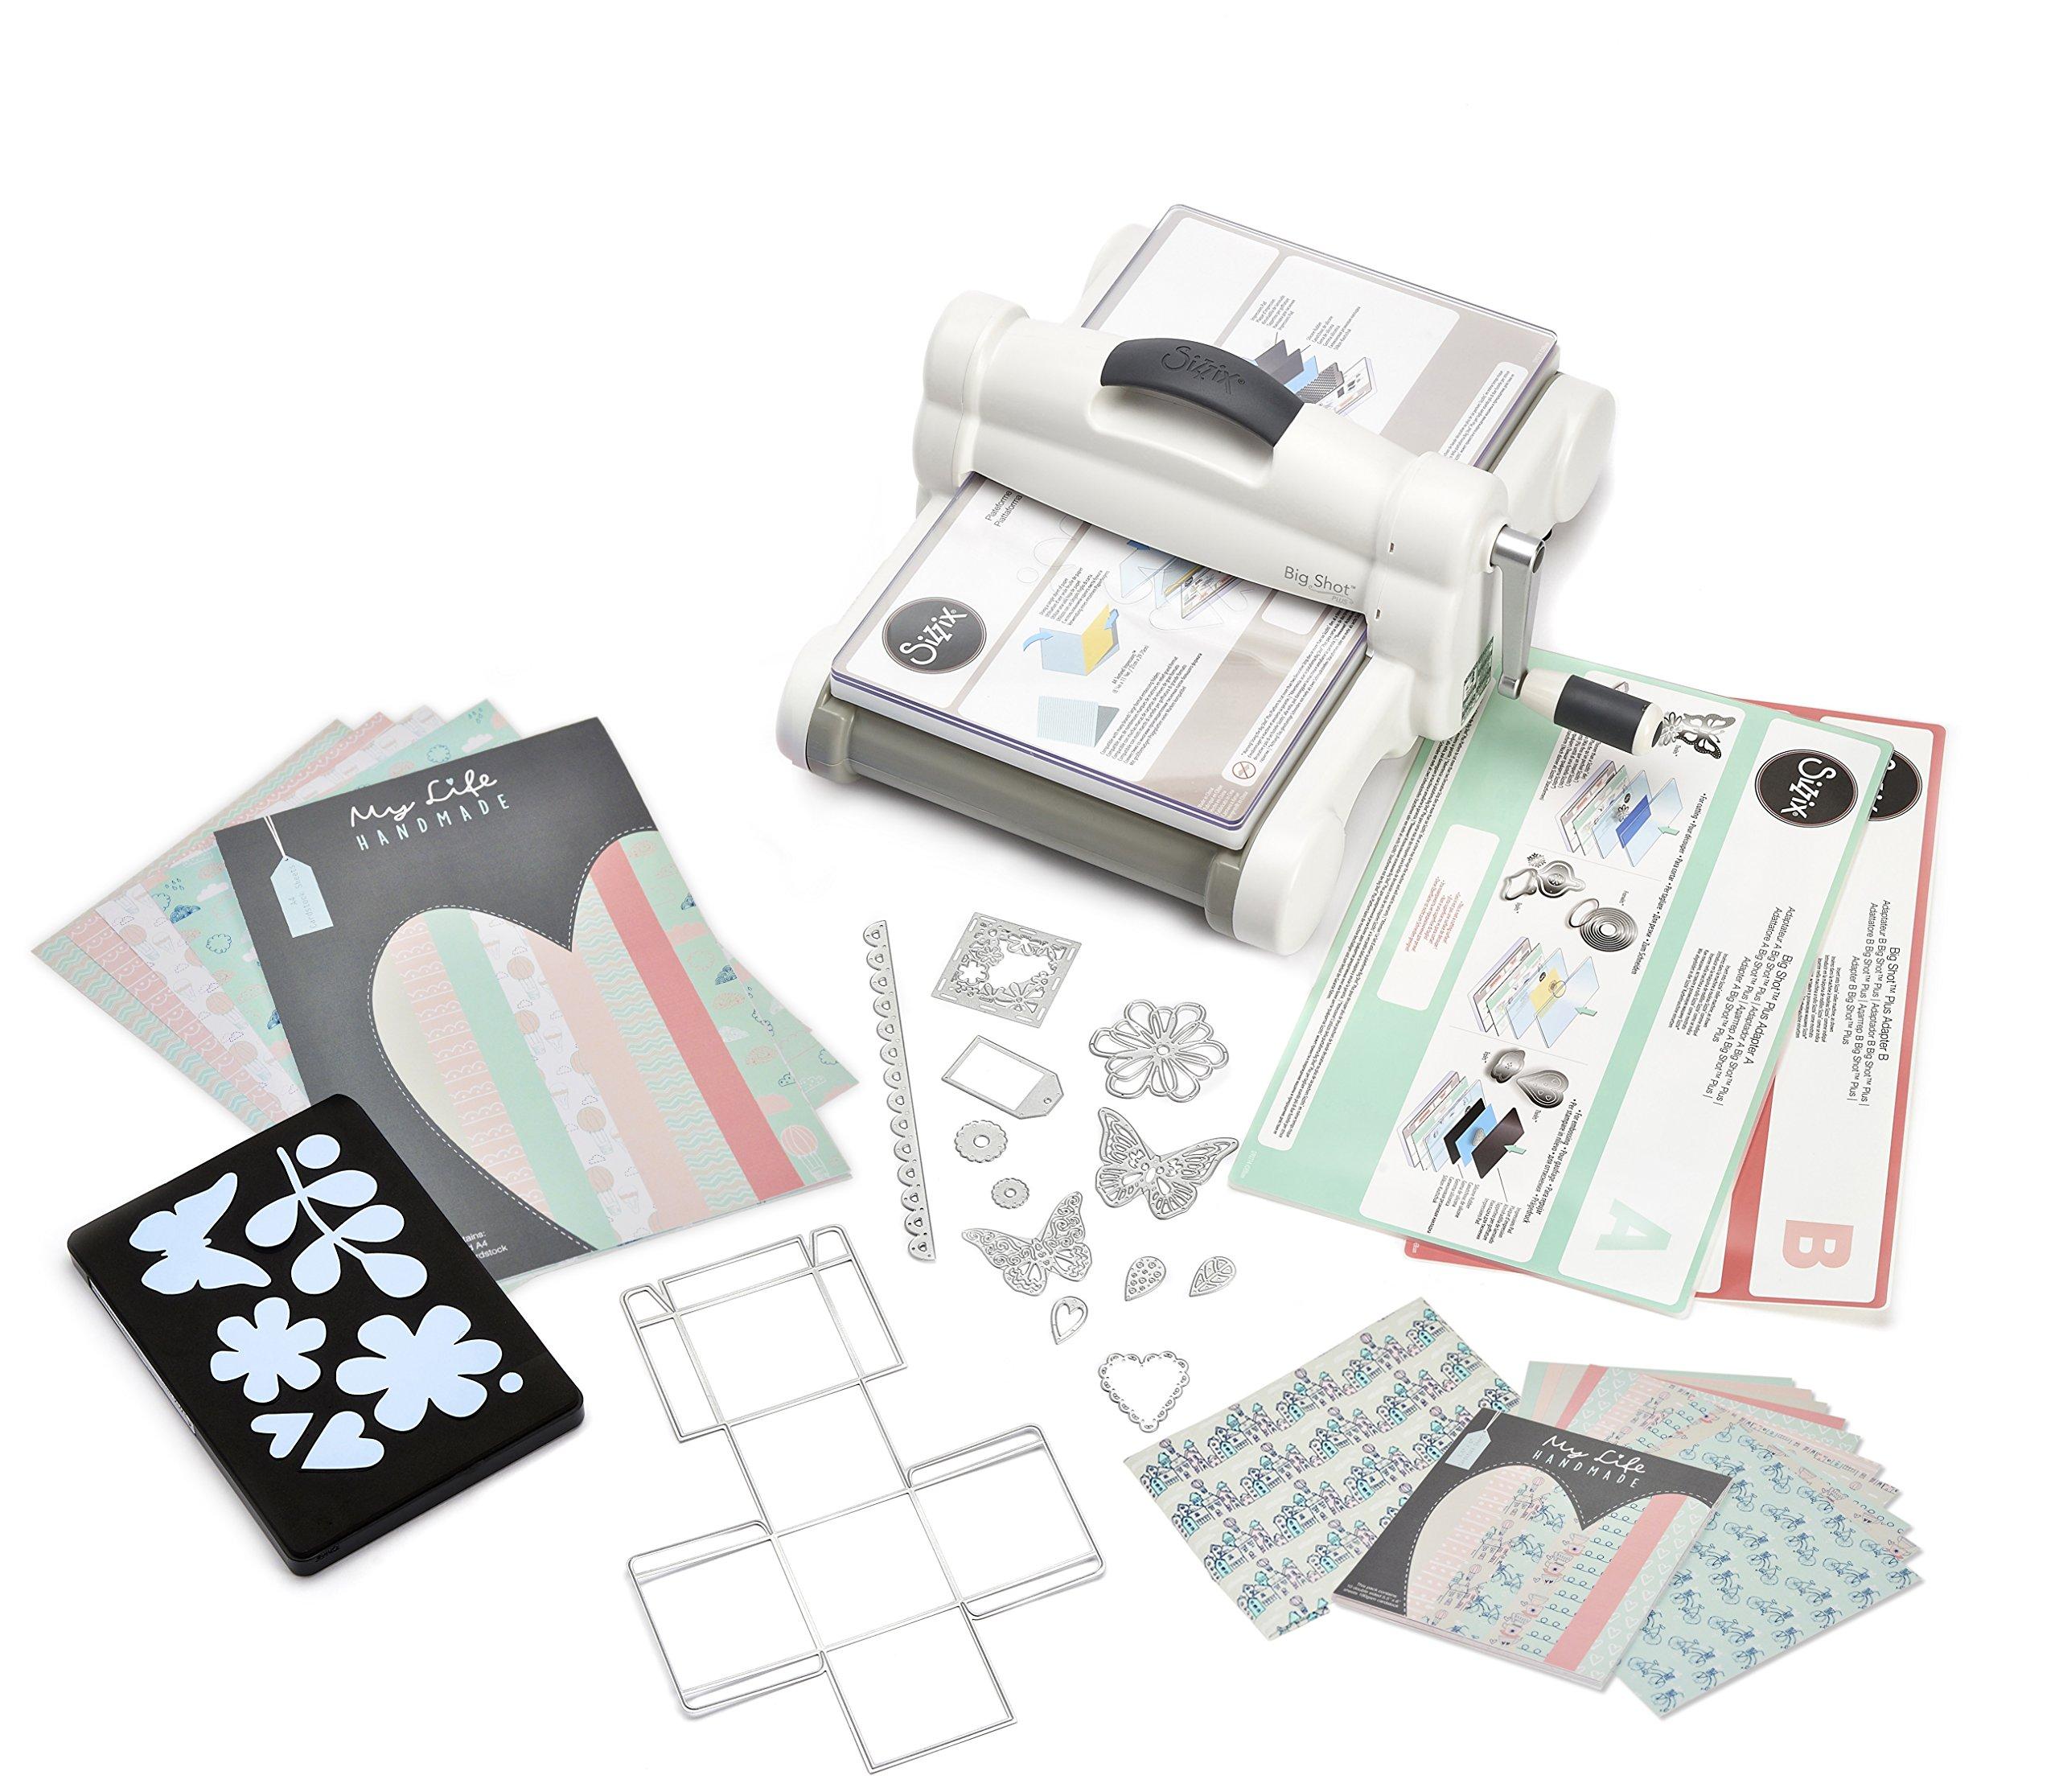 NEW Sizzix Big Shot Plus Die Cutting Machine Starter Kit Bundle Arts Crafts